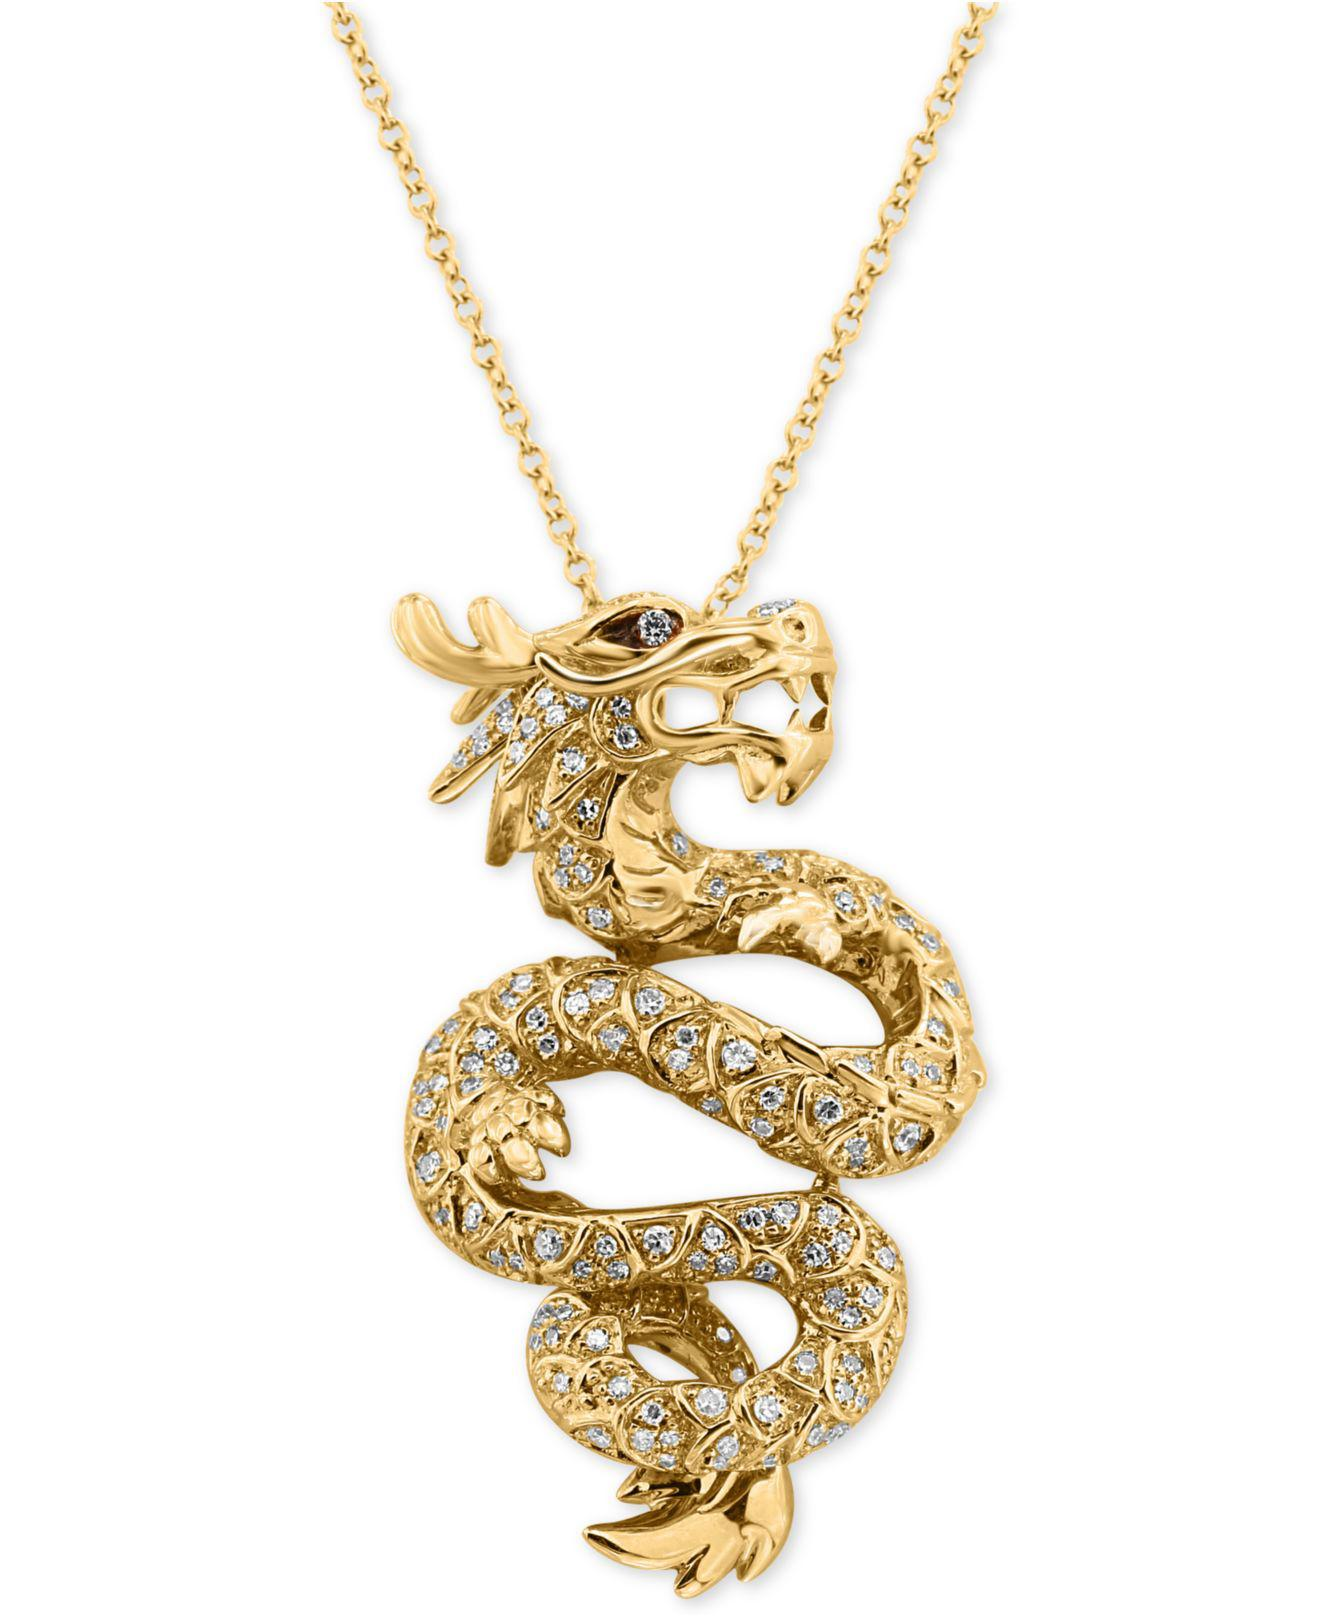 Effy Collection Diamond Dragon Pendant Necklace 5 8 Ct T